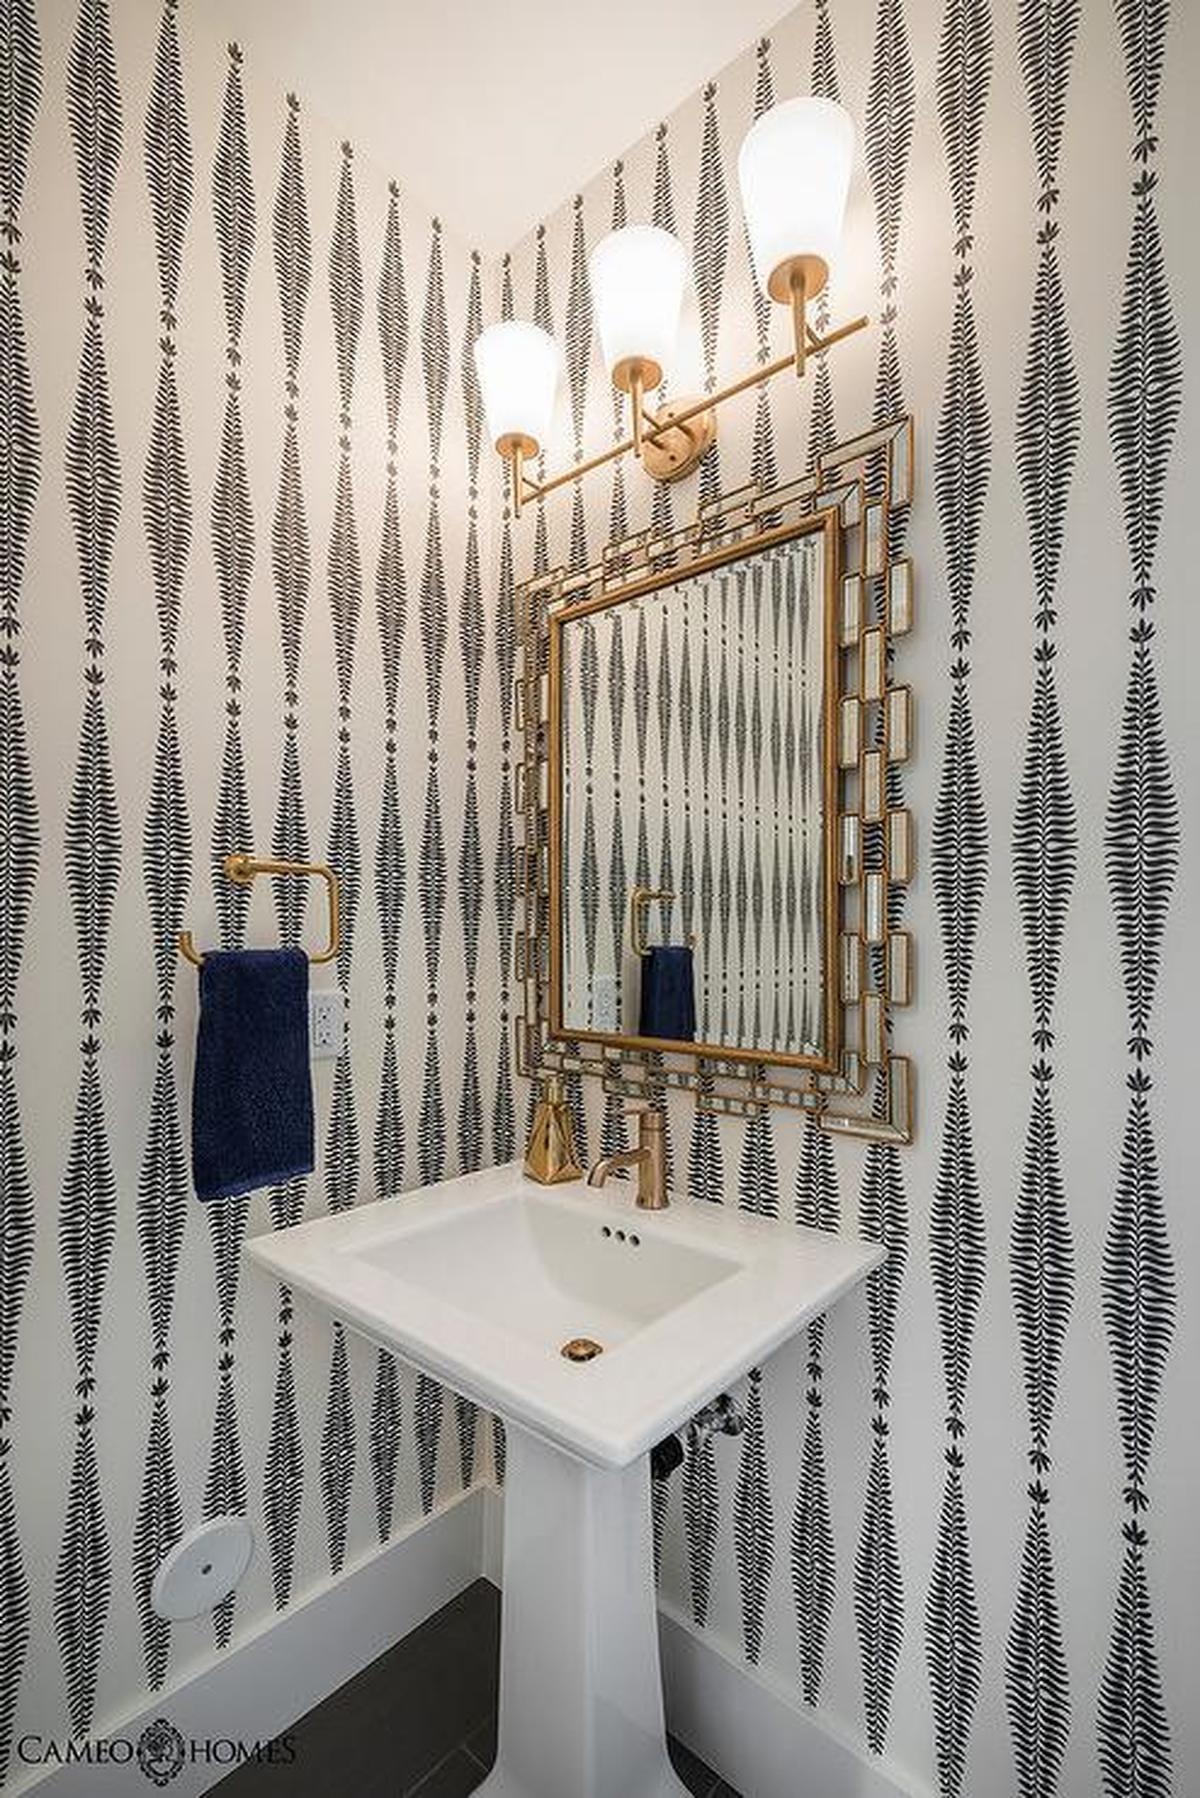 Tree Design Wallpaper Living Room: Schumacher Fern Tree Wallpaper In Noir Creme 5005070